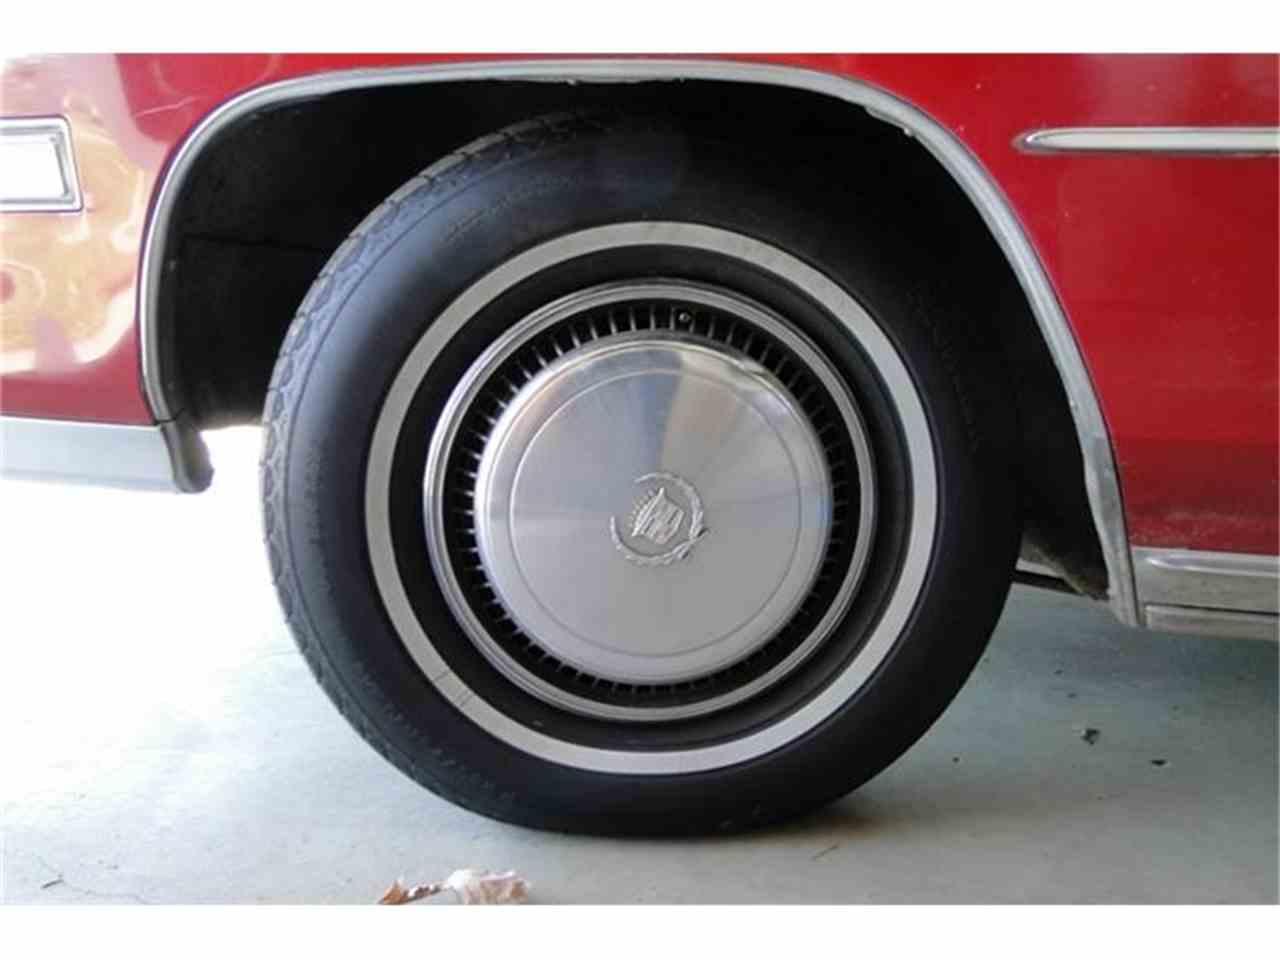 Large Picture of '75 Eldorado located in Prior Lake Minnesota - $9,500.00 - CXH4